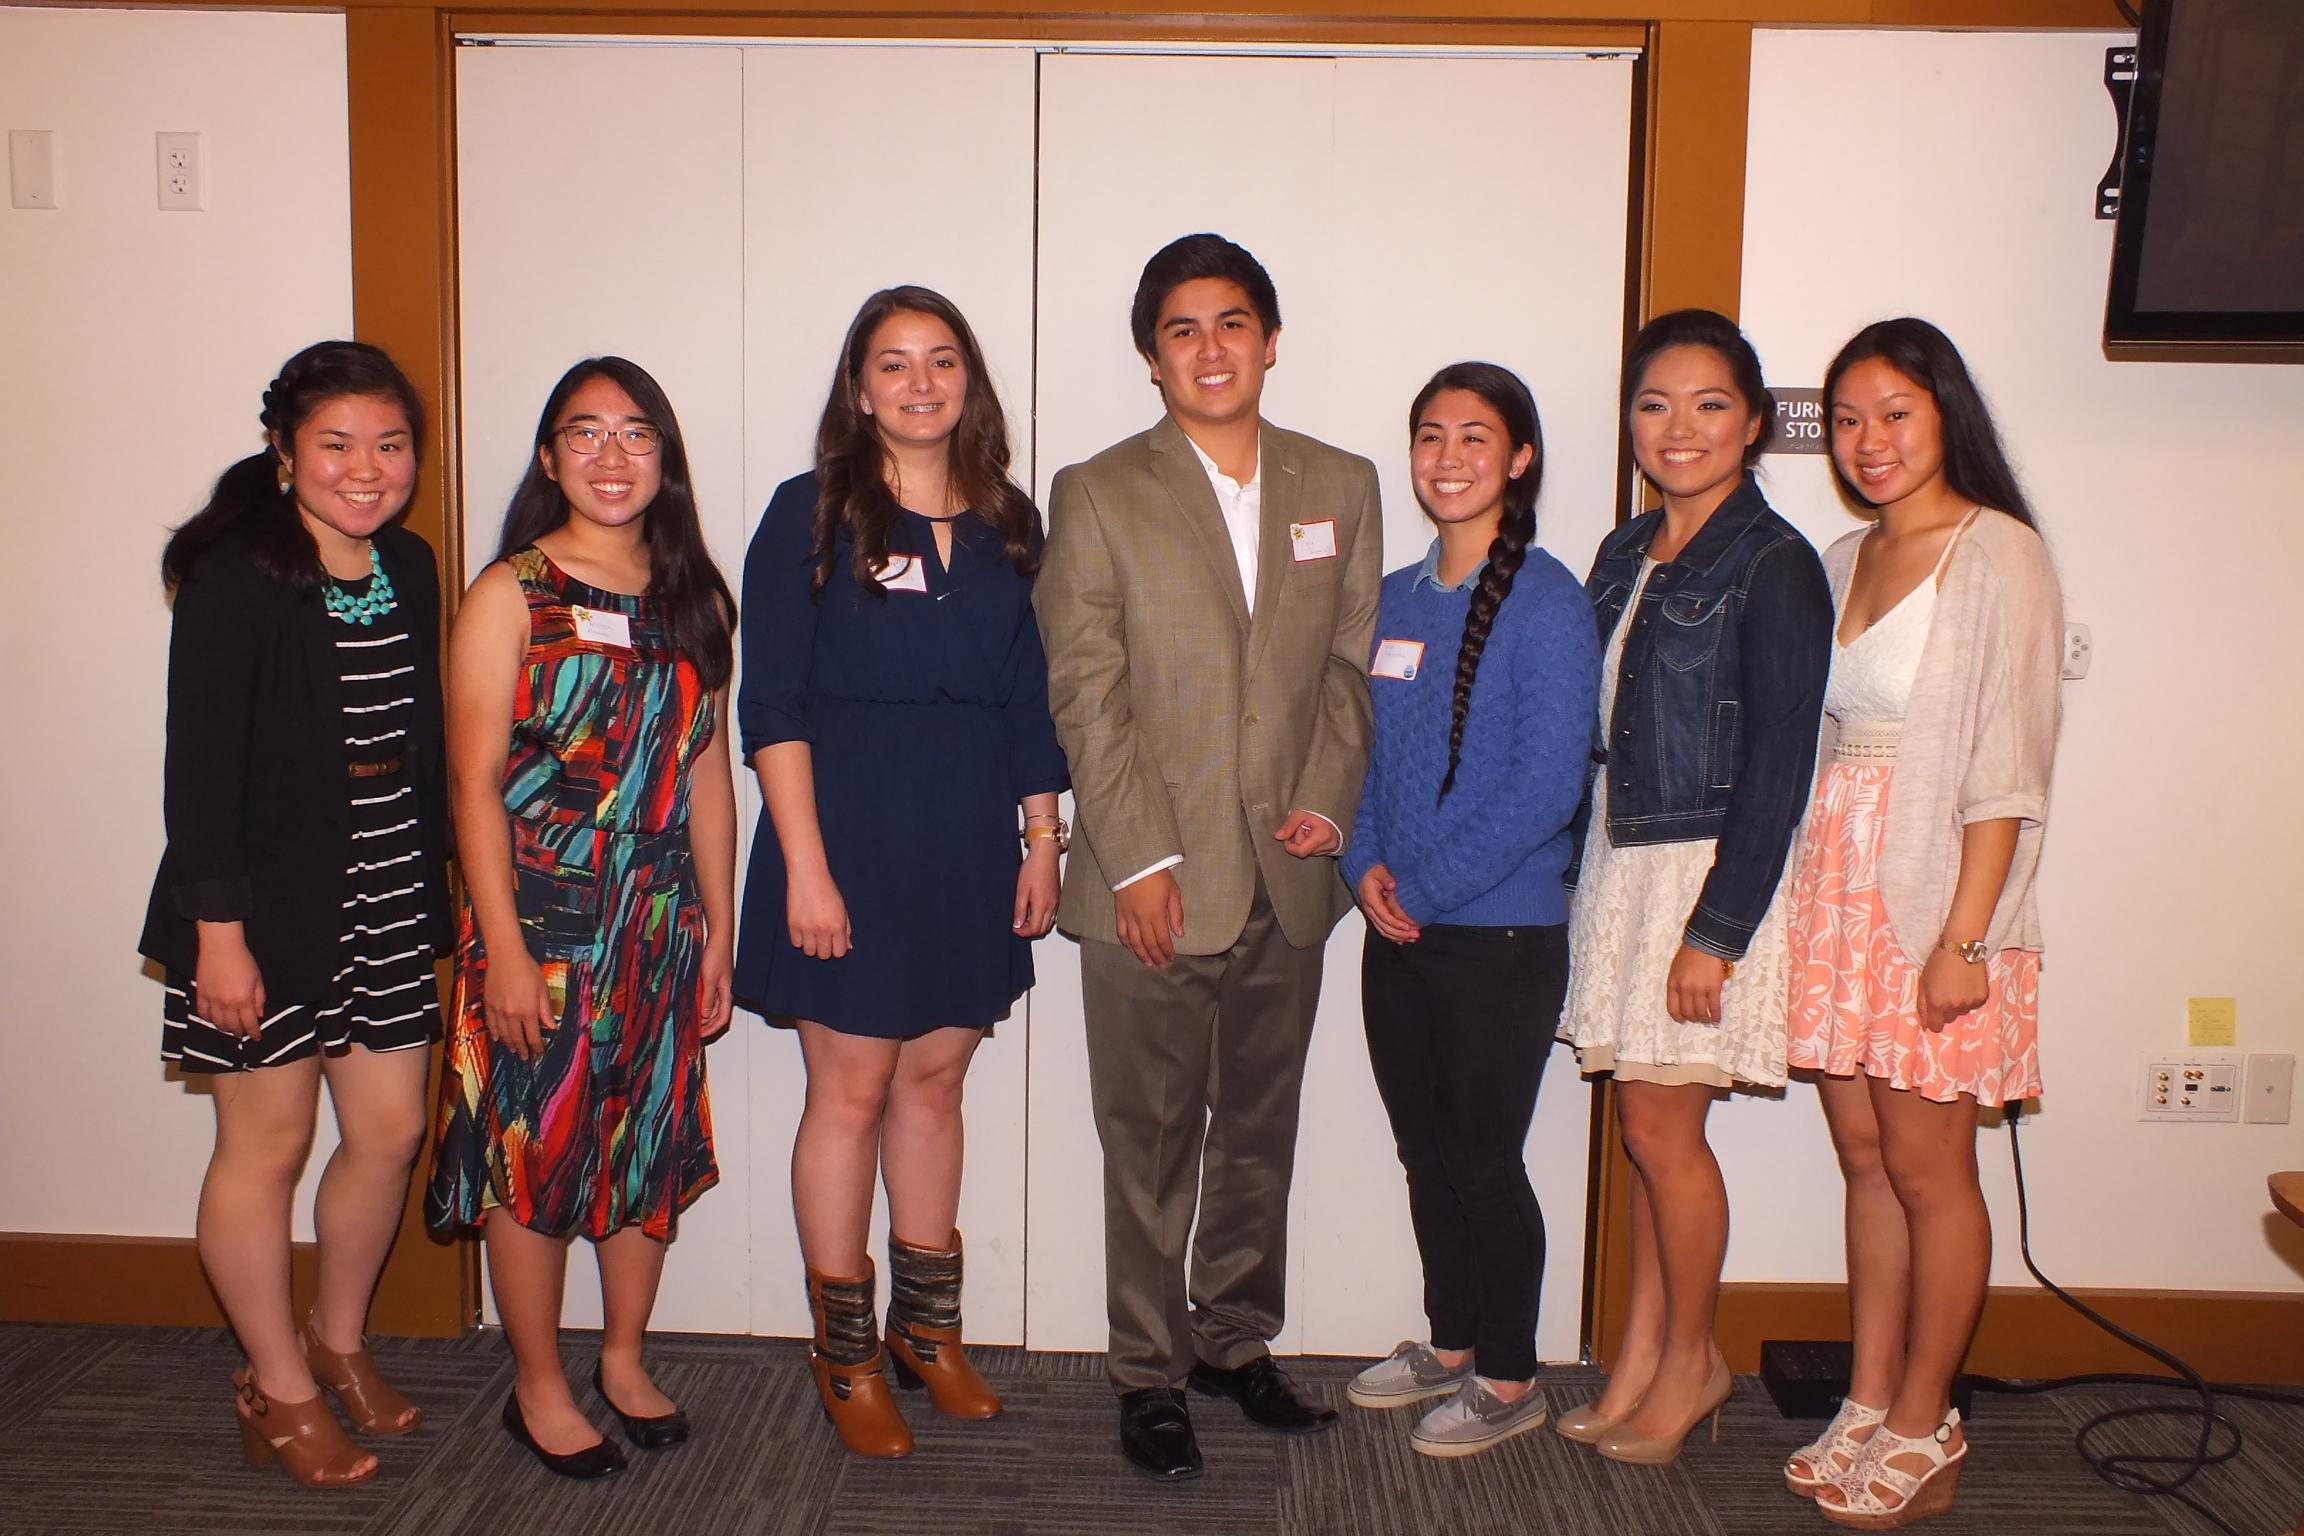 2016 Scholarship Recipients: (left to right) Megan Yabumoto, Kristen Masada, Leila Nakasone, Christopher Takeuchi, Kylie Kuwada, Alson Shikada, Jemma Jio